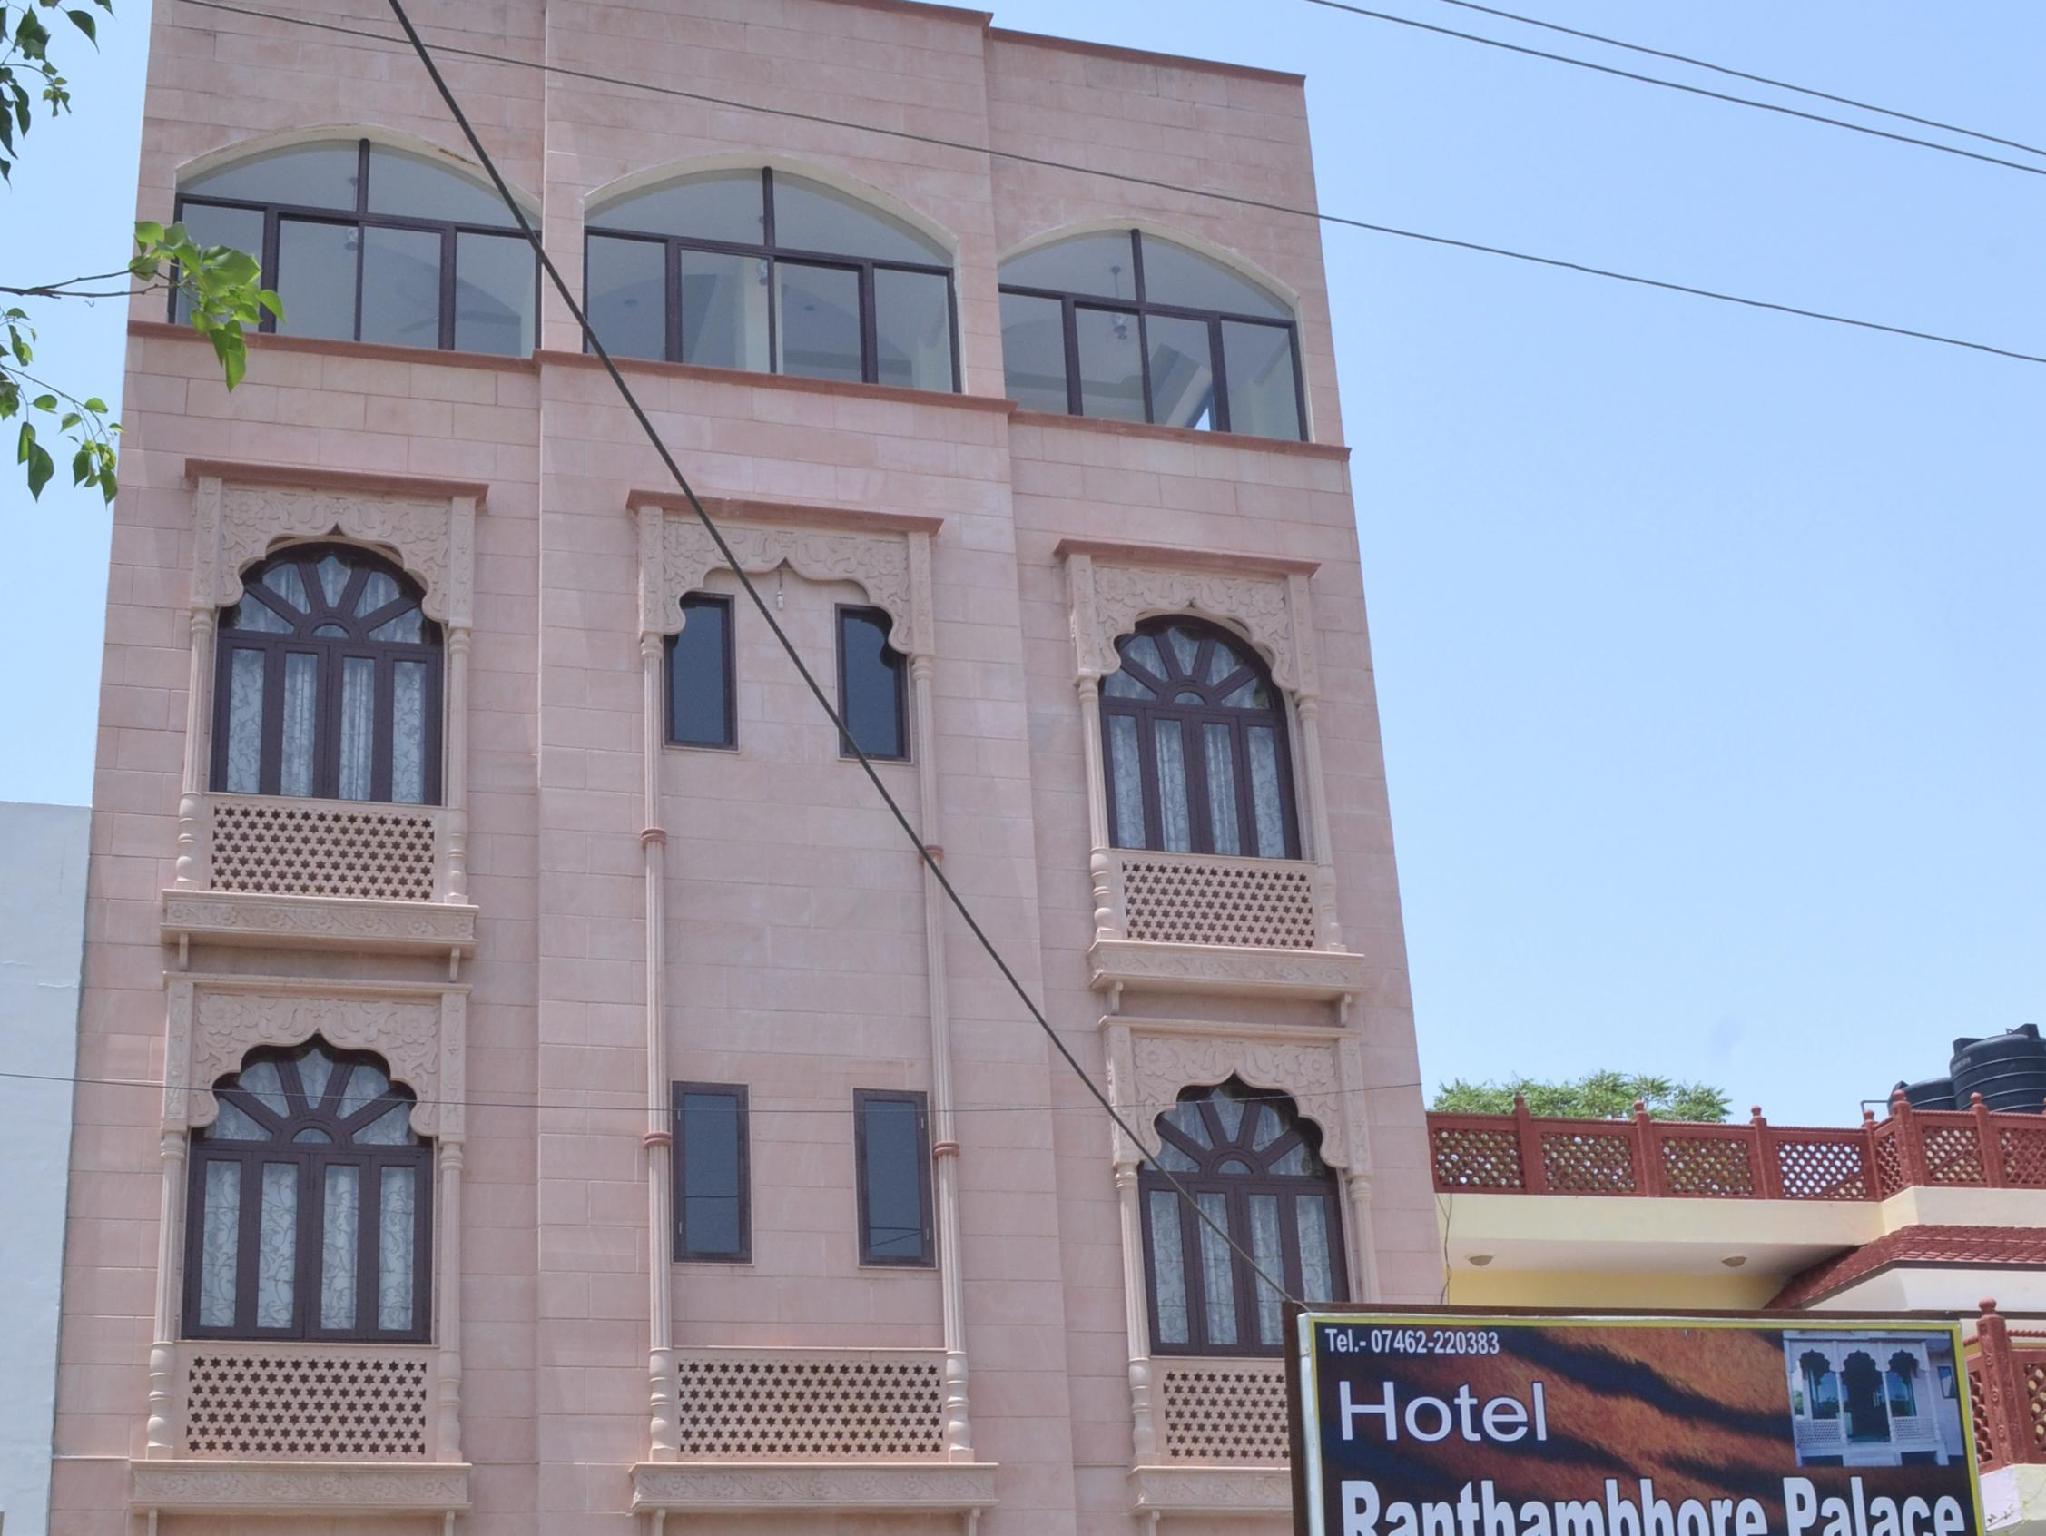 Hotel Ranthambhore Palace - Ranthambore